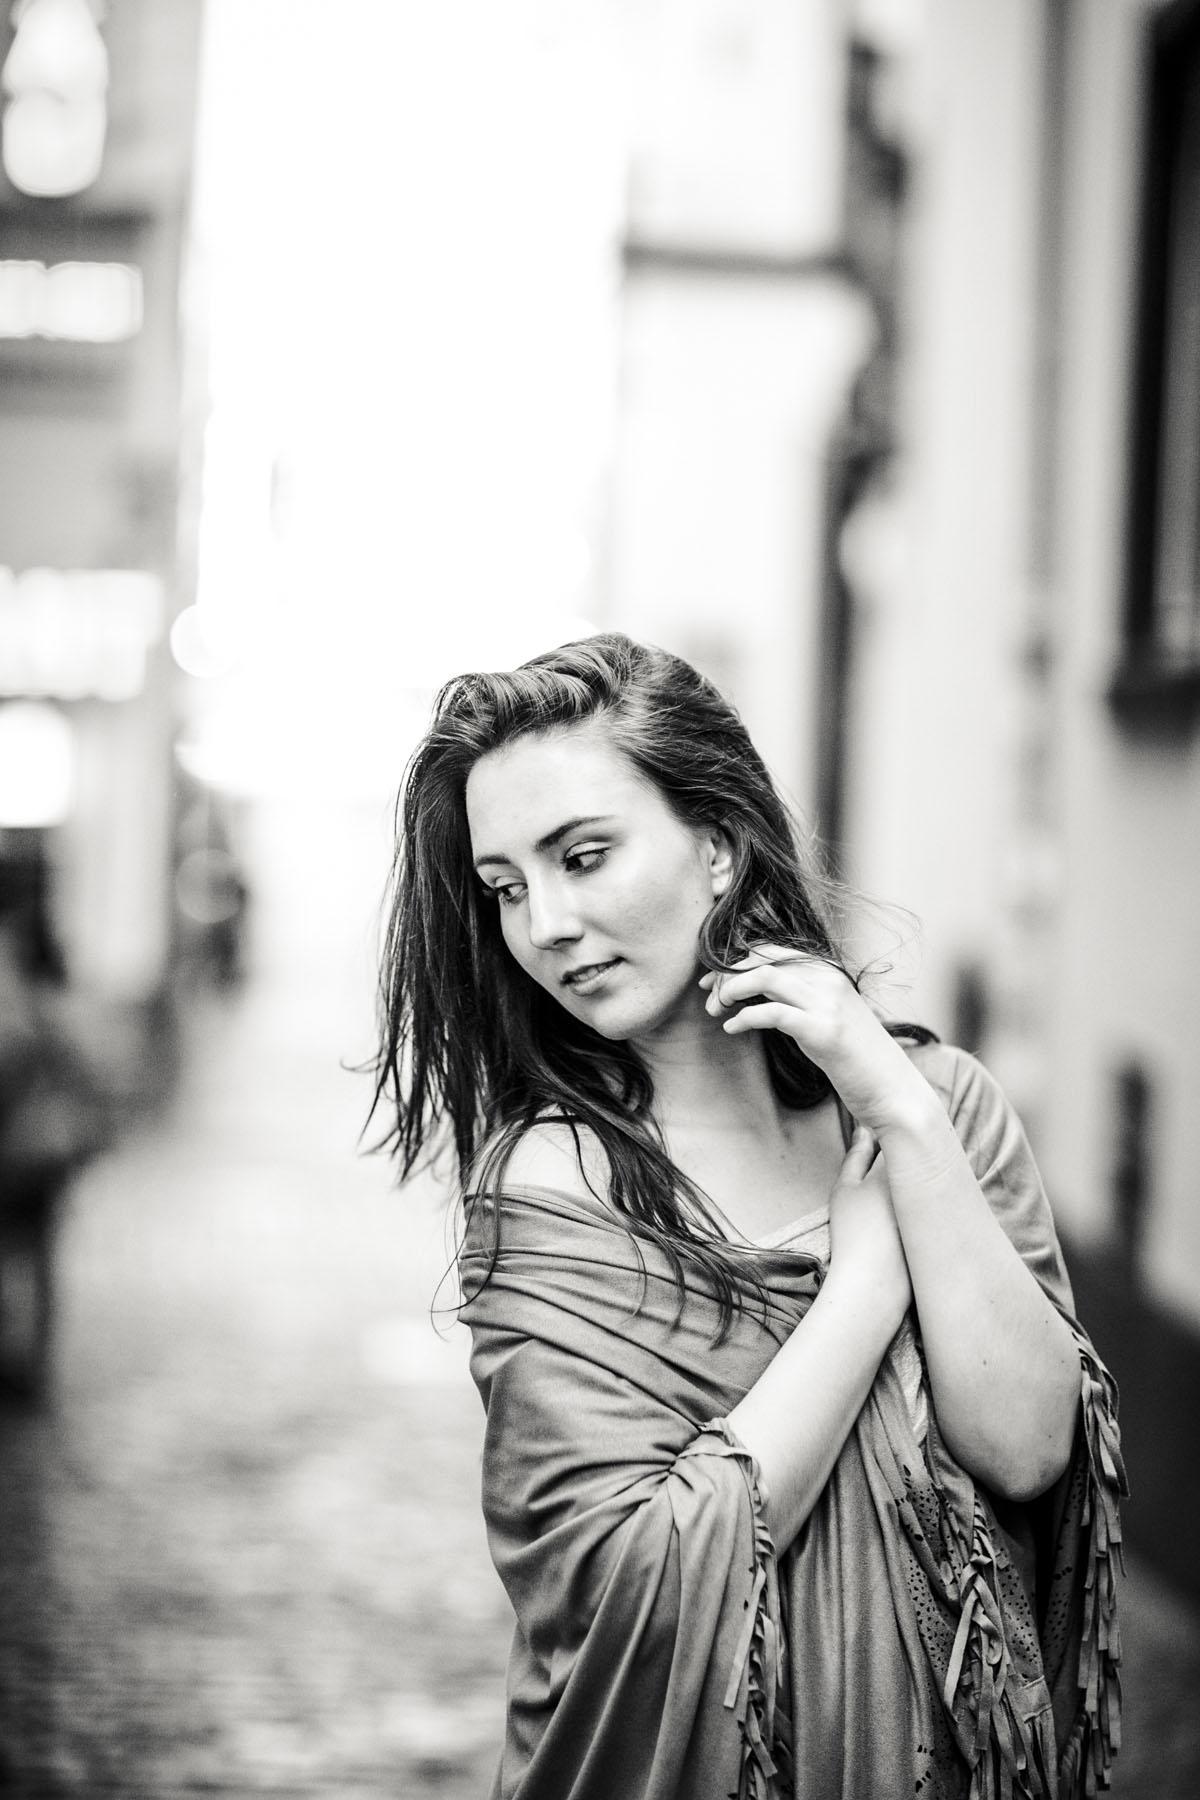 Stella - Urbanes Fotoshooting in Kölner Innenstadt - Fotografin Guelten Hamidanoglu Koeln portraits  25